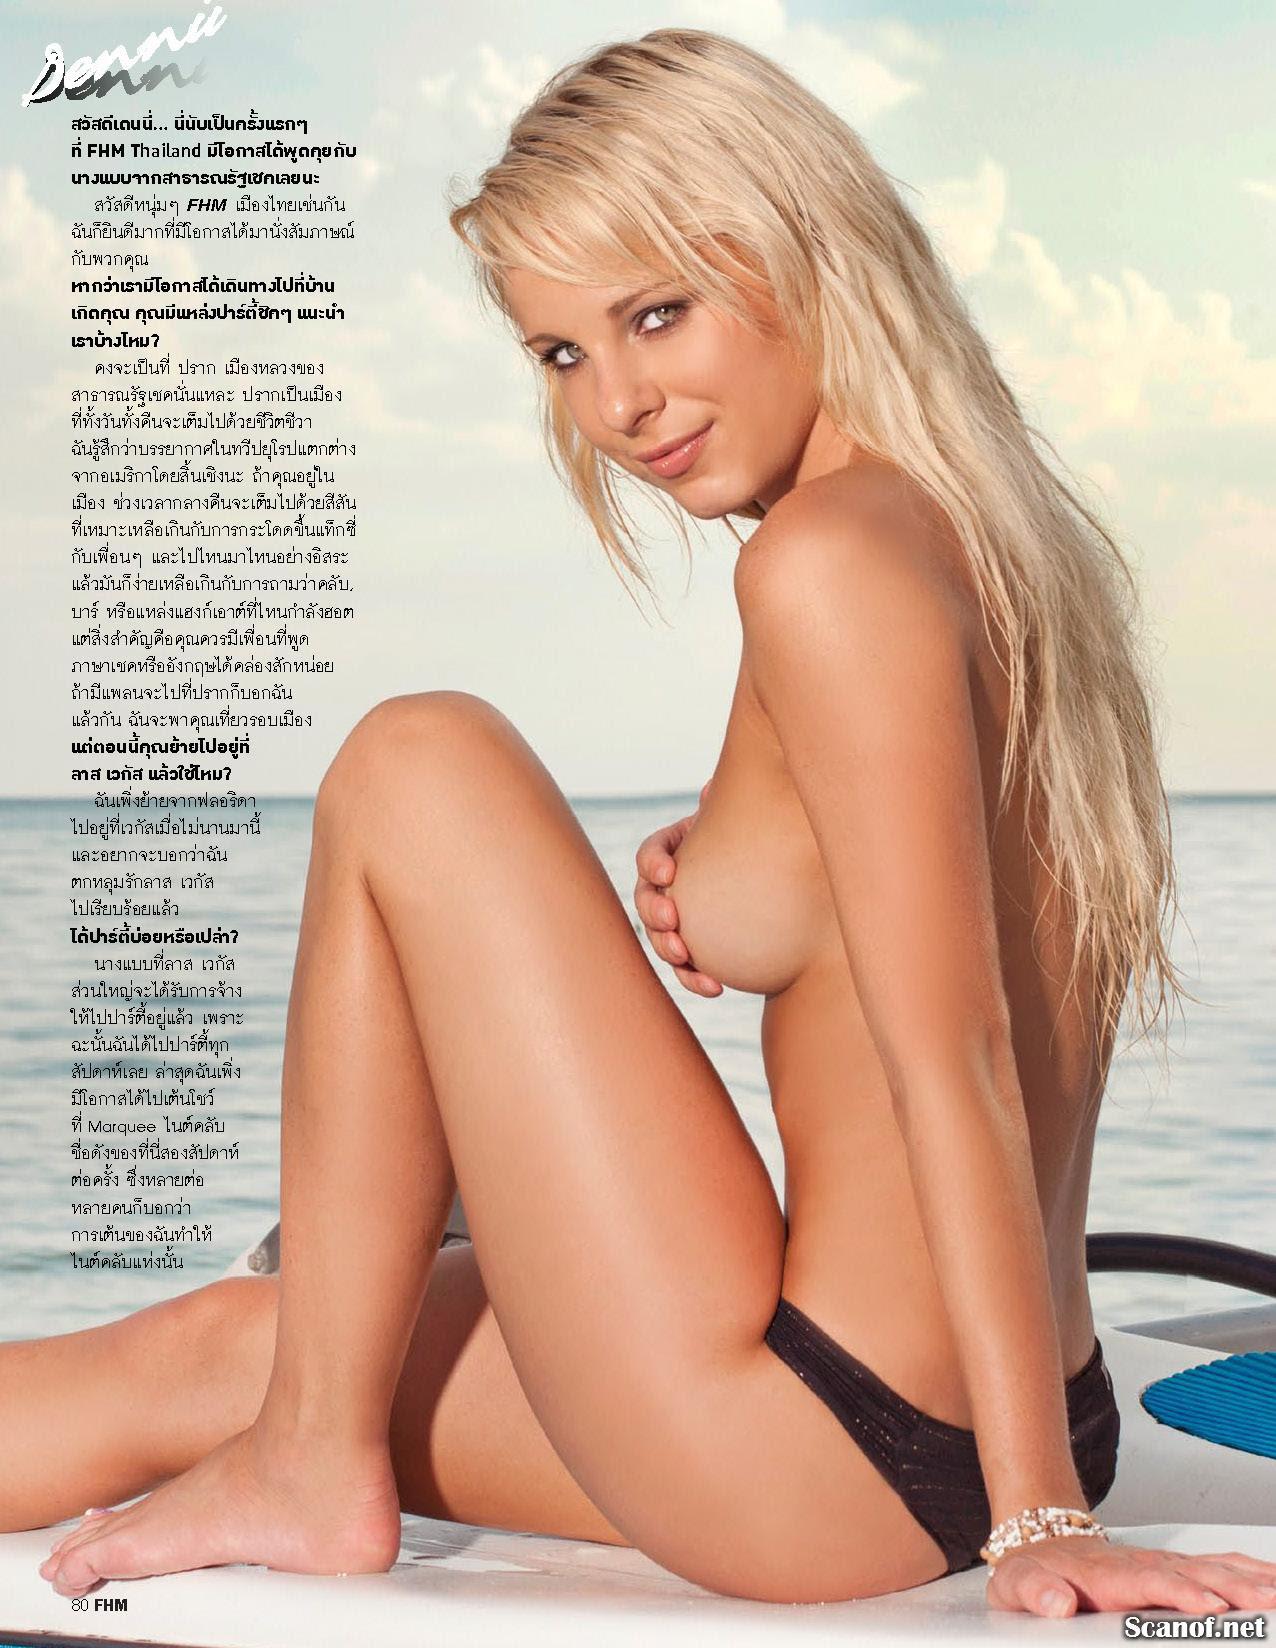 Paulina Gretzky Topless : paulina, gretzky, topless, Paulina, Gretzky, Photos, XPornxhd